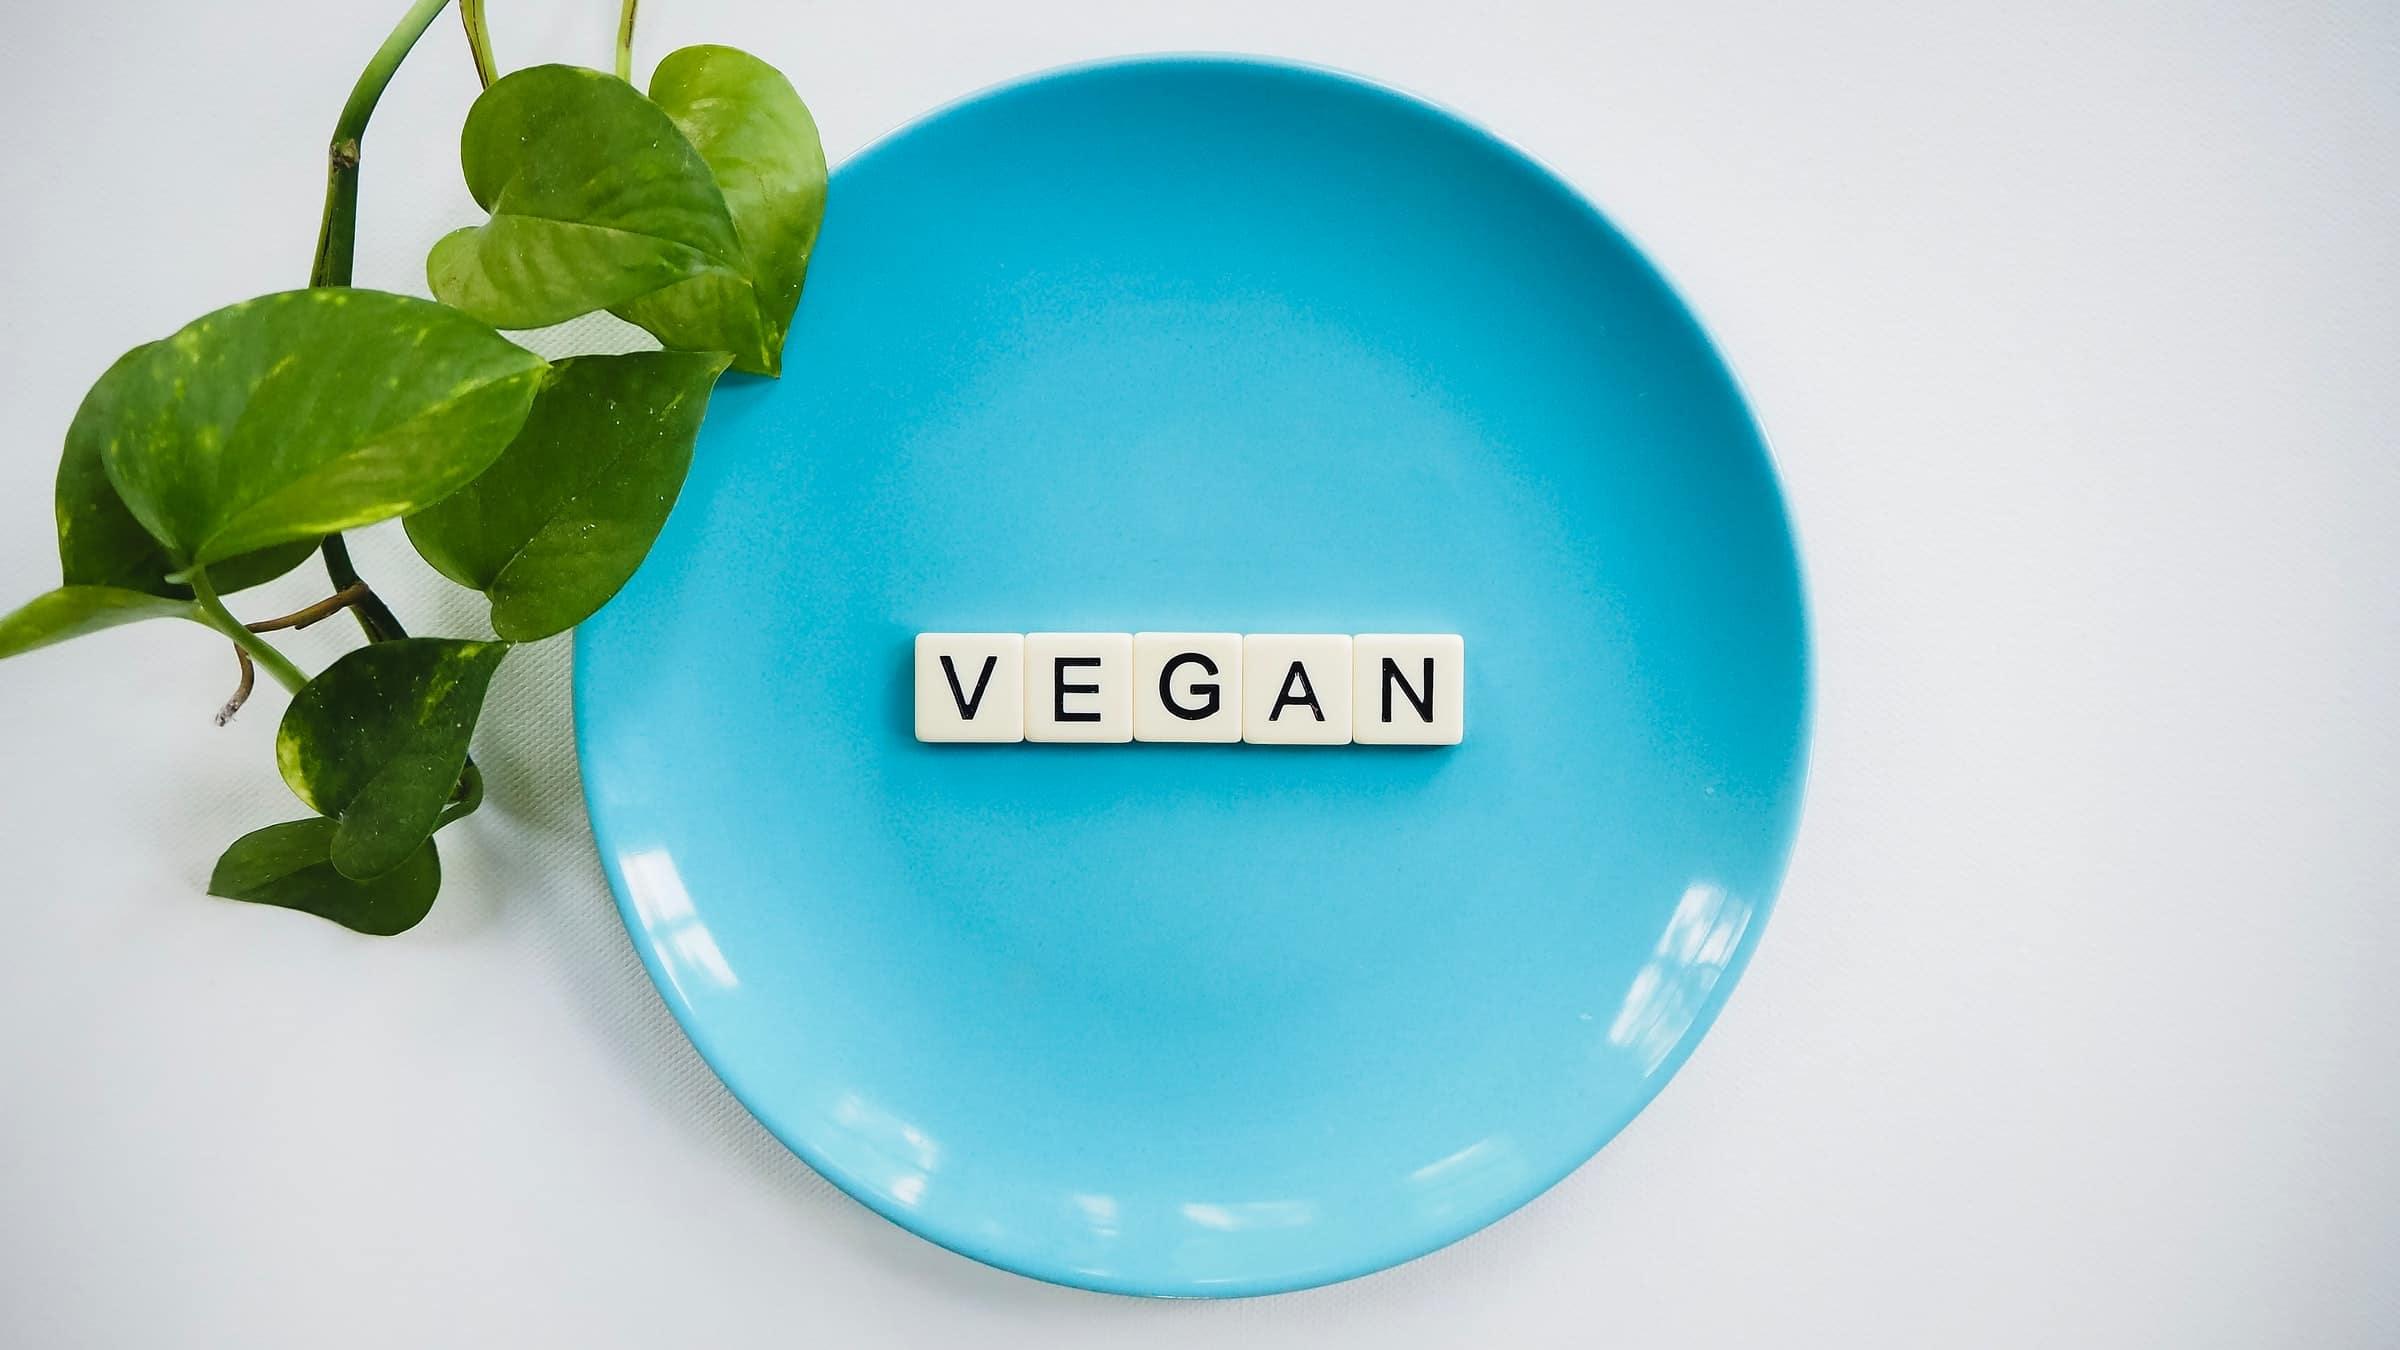 vergan plate hero image